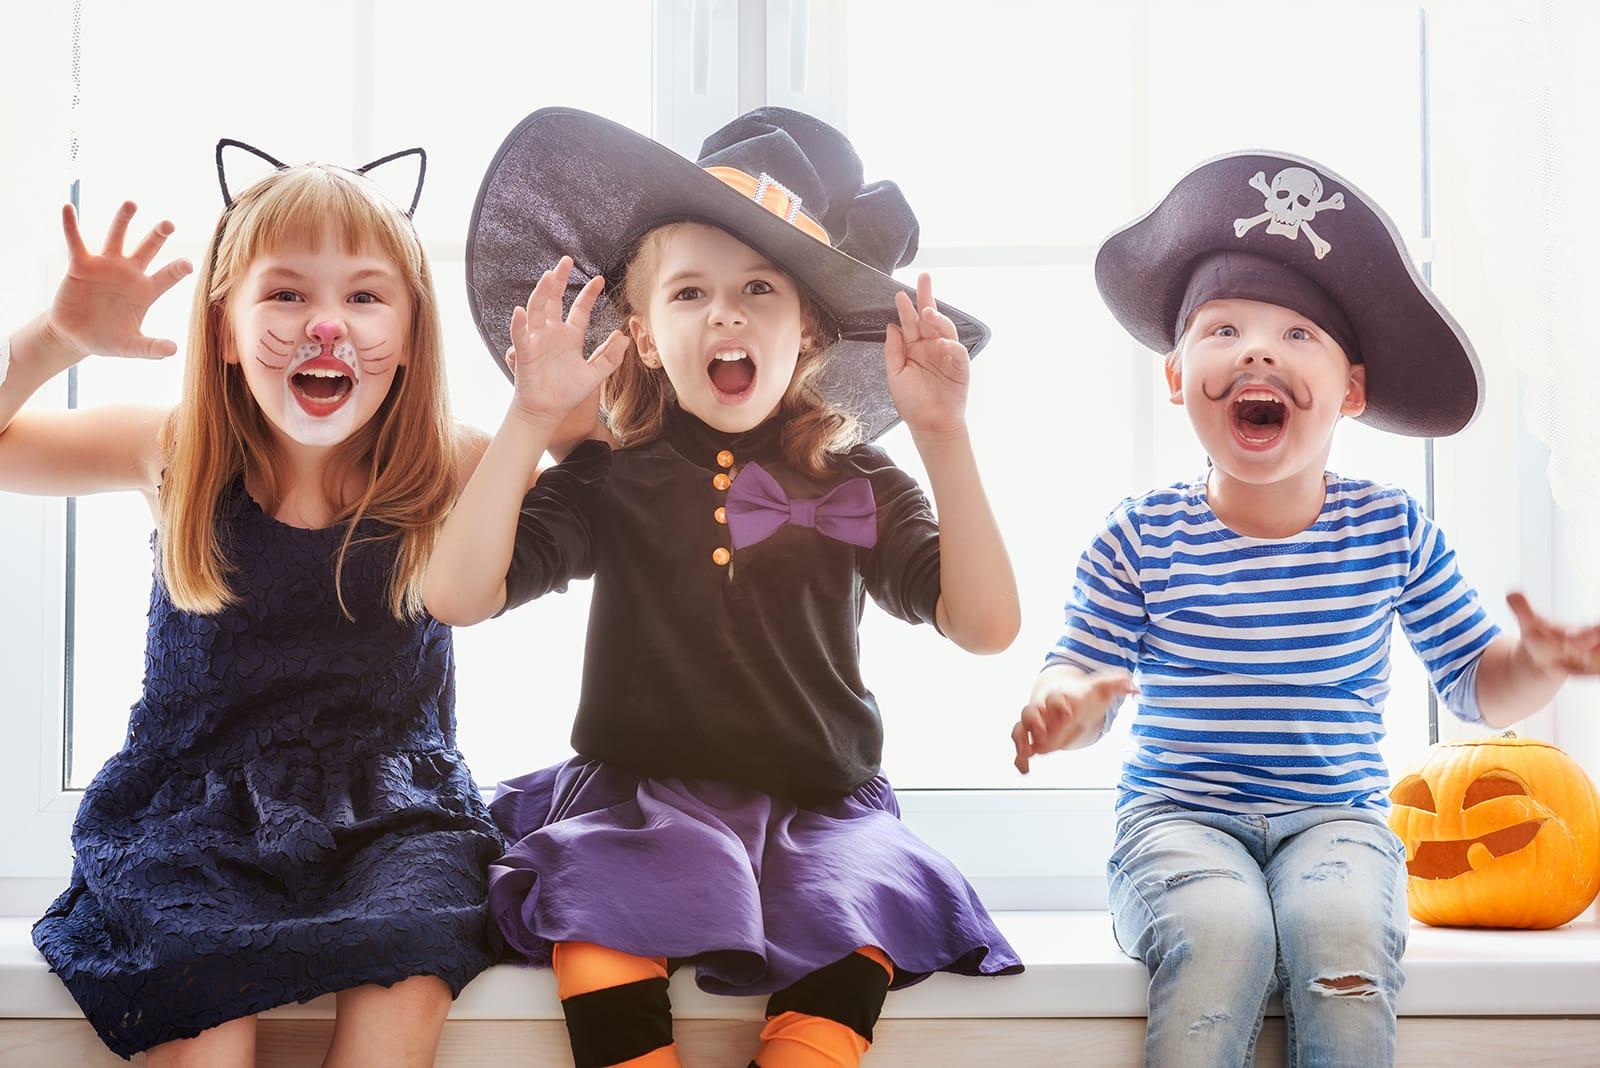 Halloween Safety Tips for Your Greenville, McKinney, Rowlett or Sherman Family